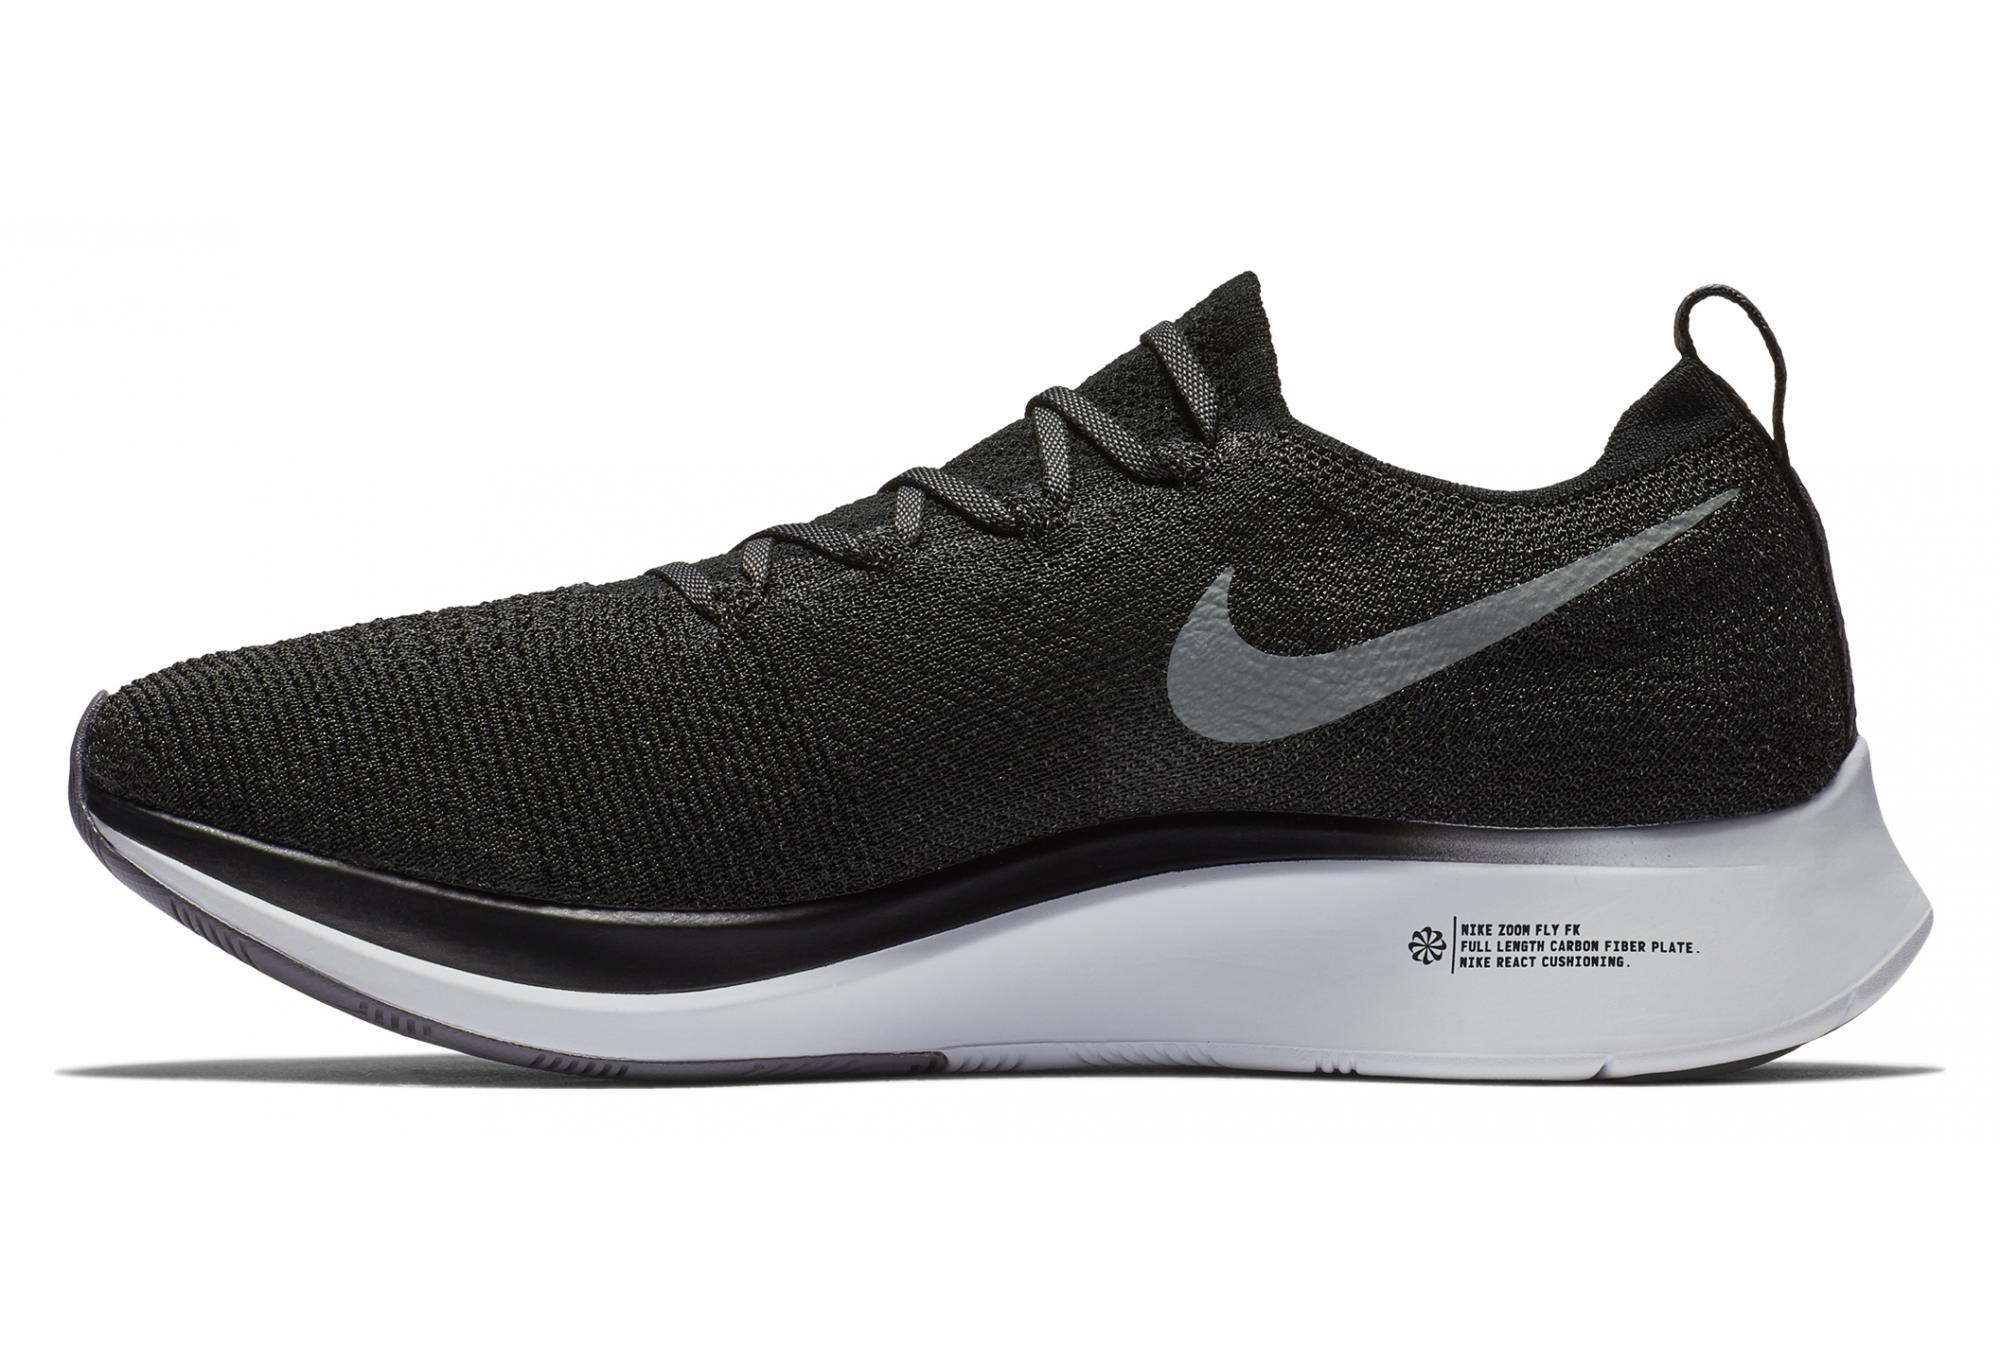 best website ecb41 72594 Chaussures de Running Nike Zoom Fly Flyknit Noir